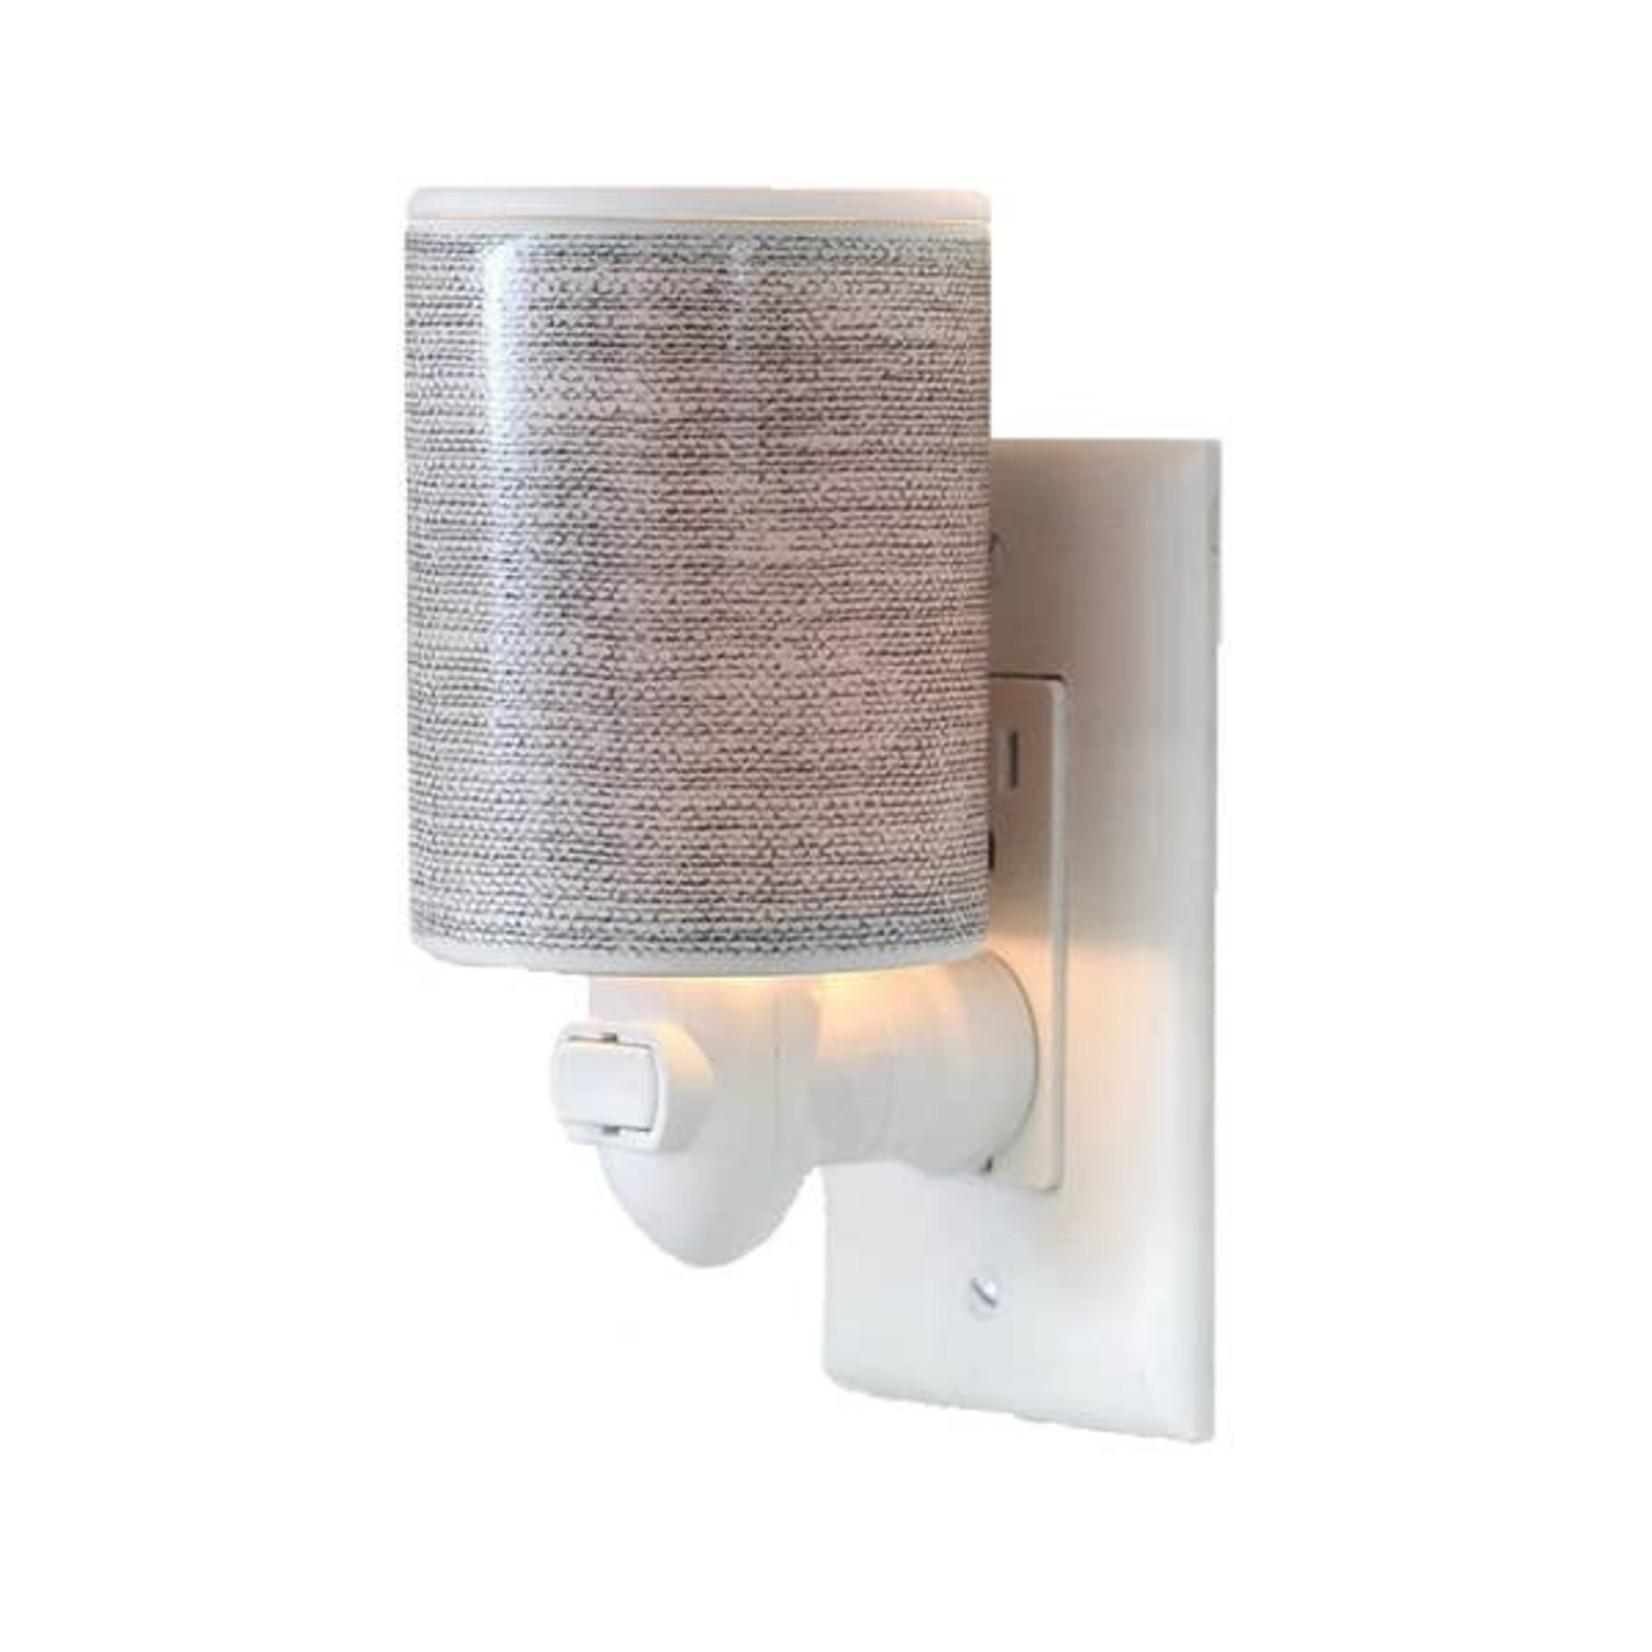 Happy Wax Outlet warmer - Grey linen